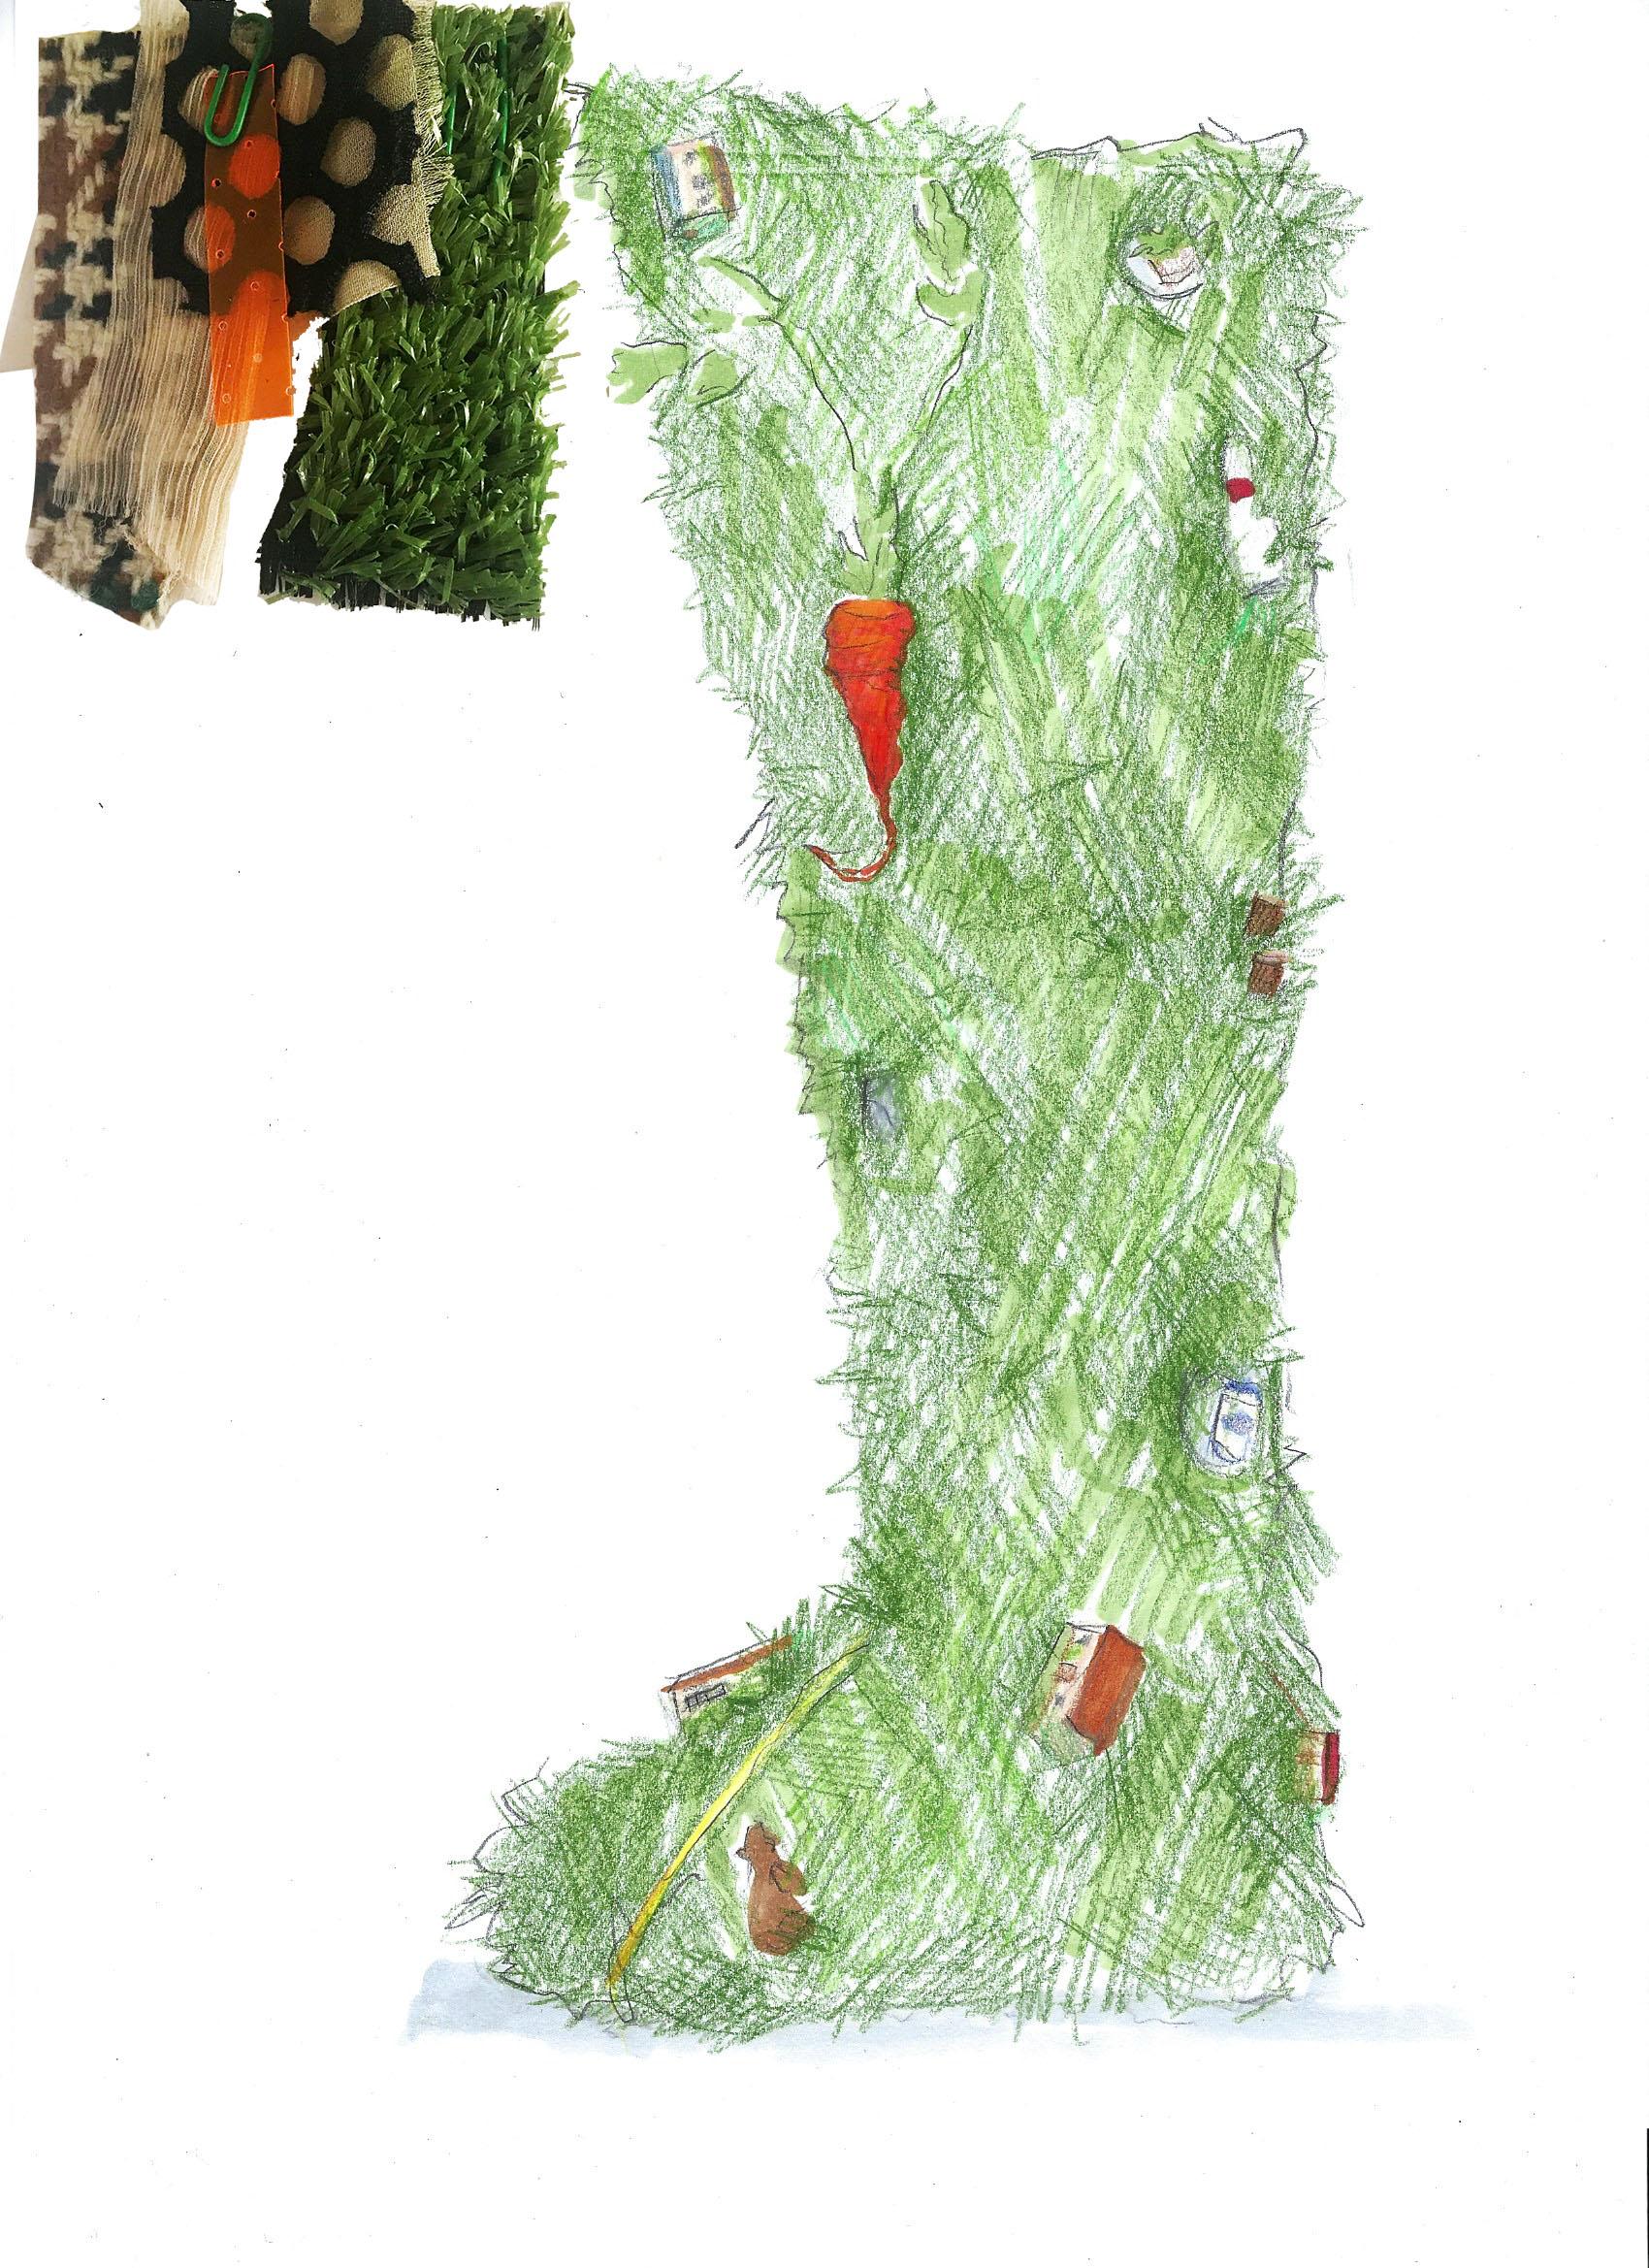 astroturf boots illustration.jpg